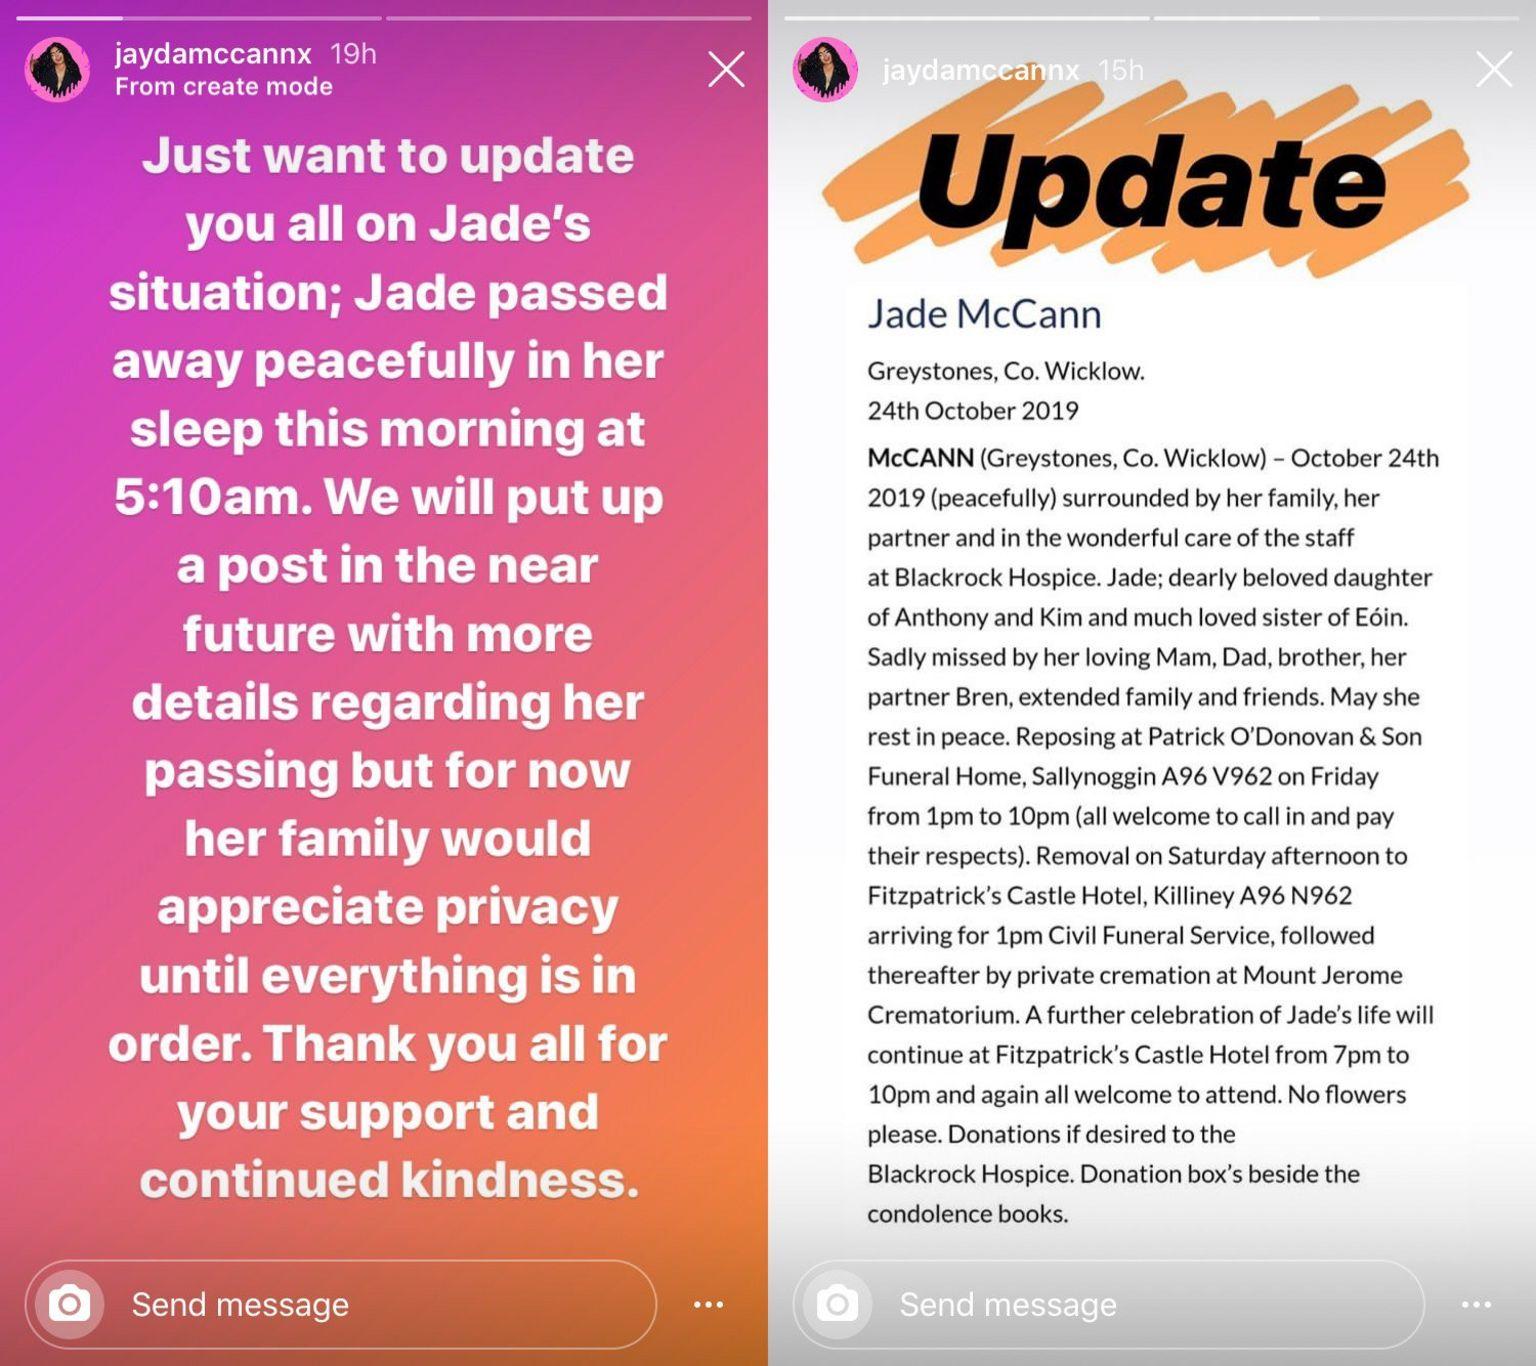 Jayda McCann Instagram story